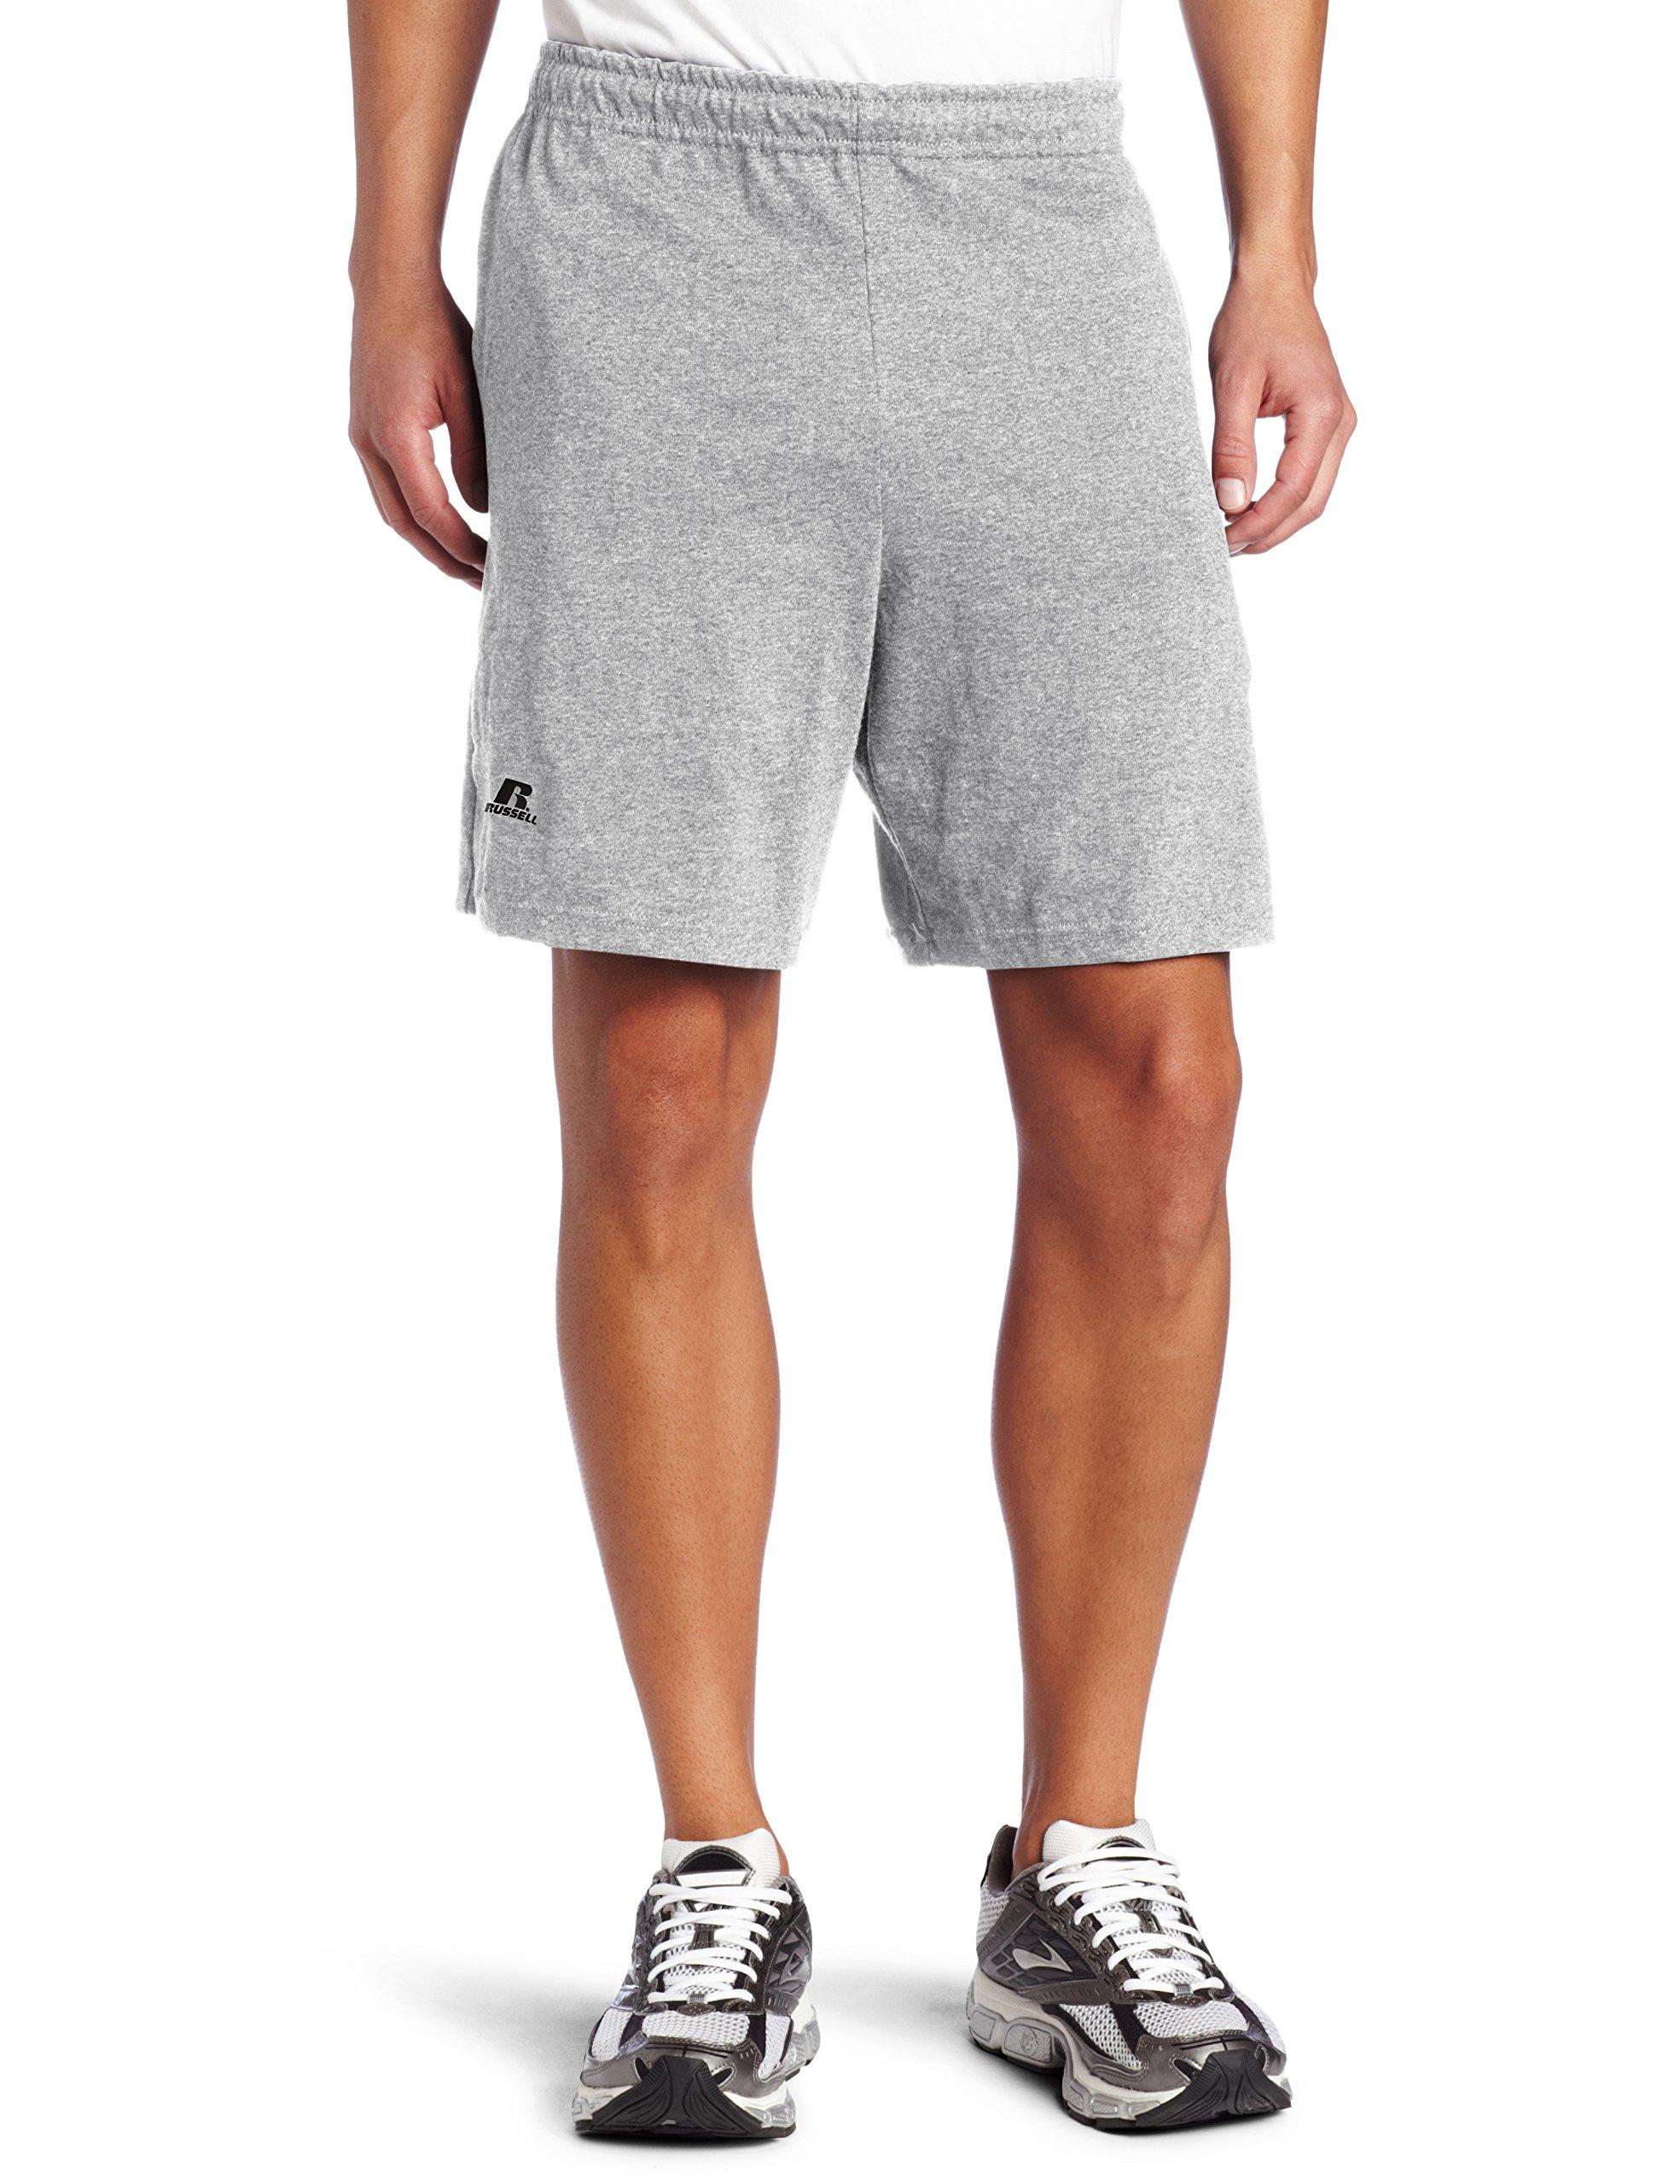 a0e0ba7e7c Get Quotations · Russell Athletic Men's Cotton Performance Baseline Short